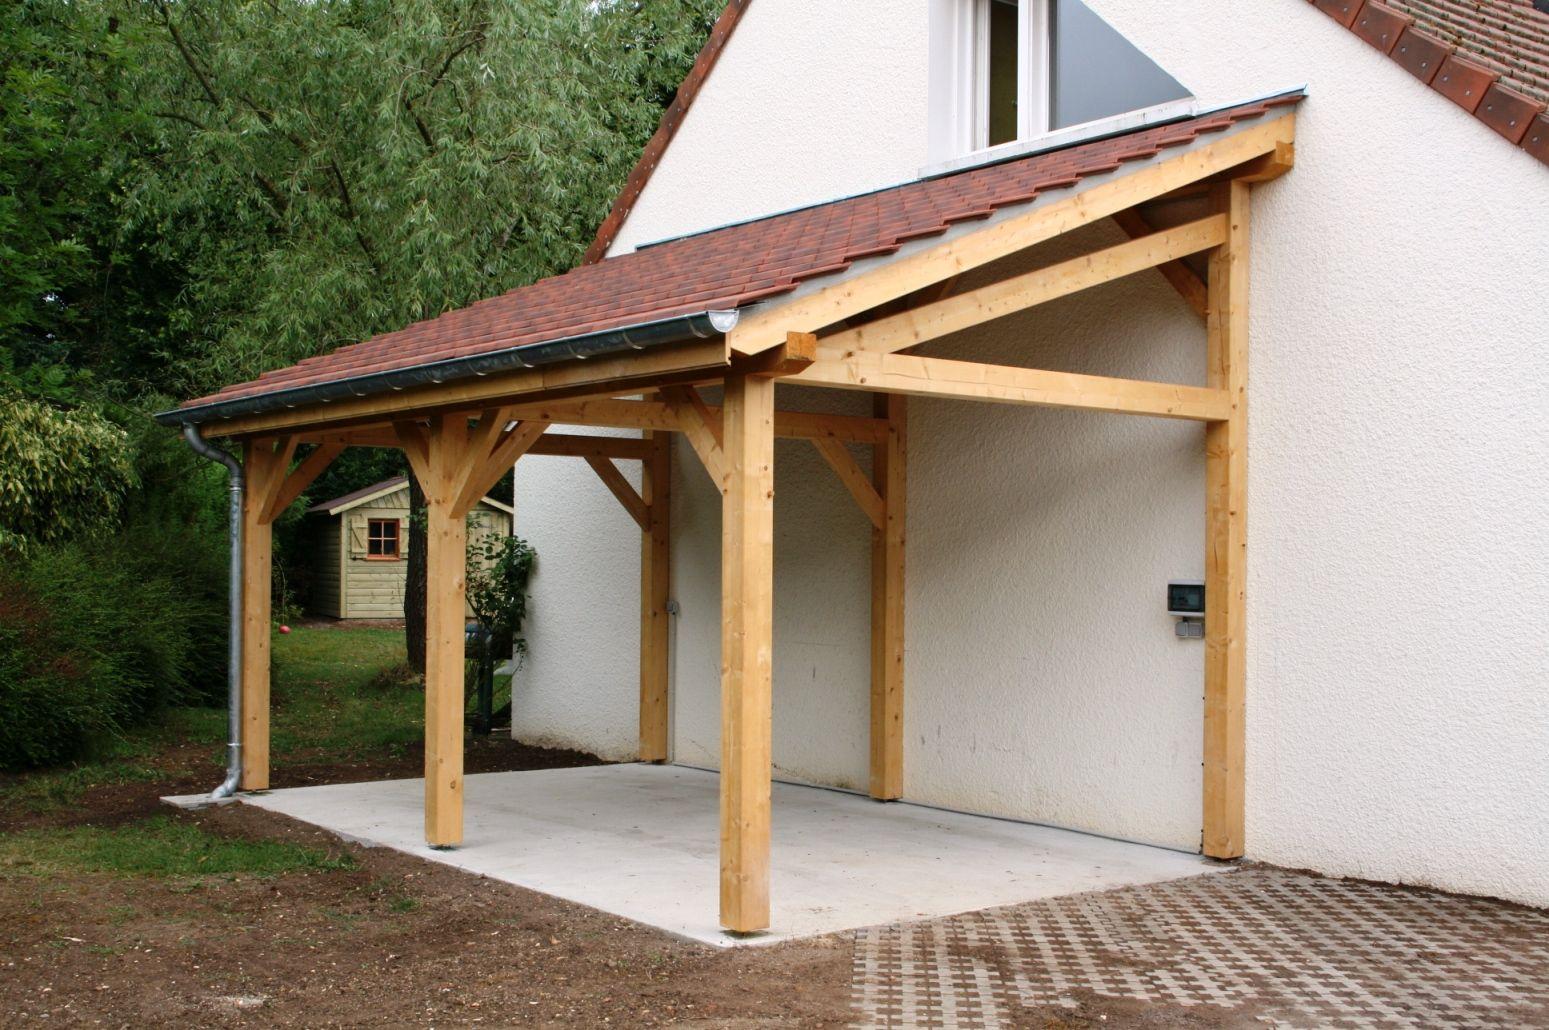 Garage 1 Pente 2.70Mx7.00M - Cerisier : Abris De Jardin En ... avec Abri Terrasse Bois